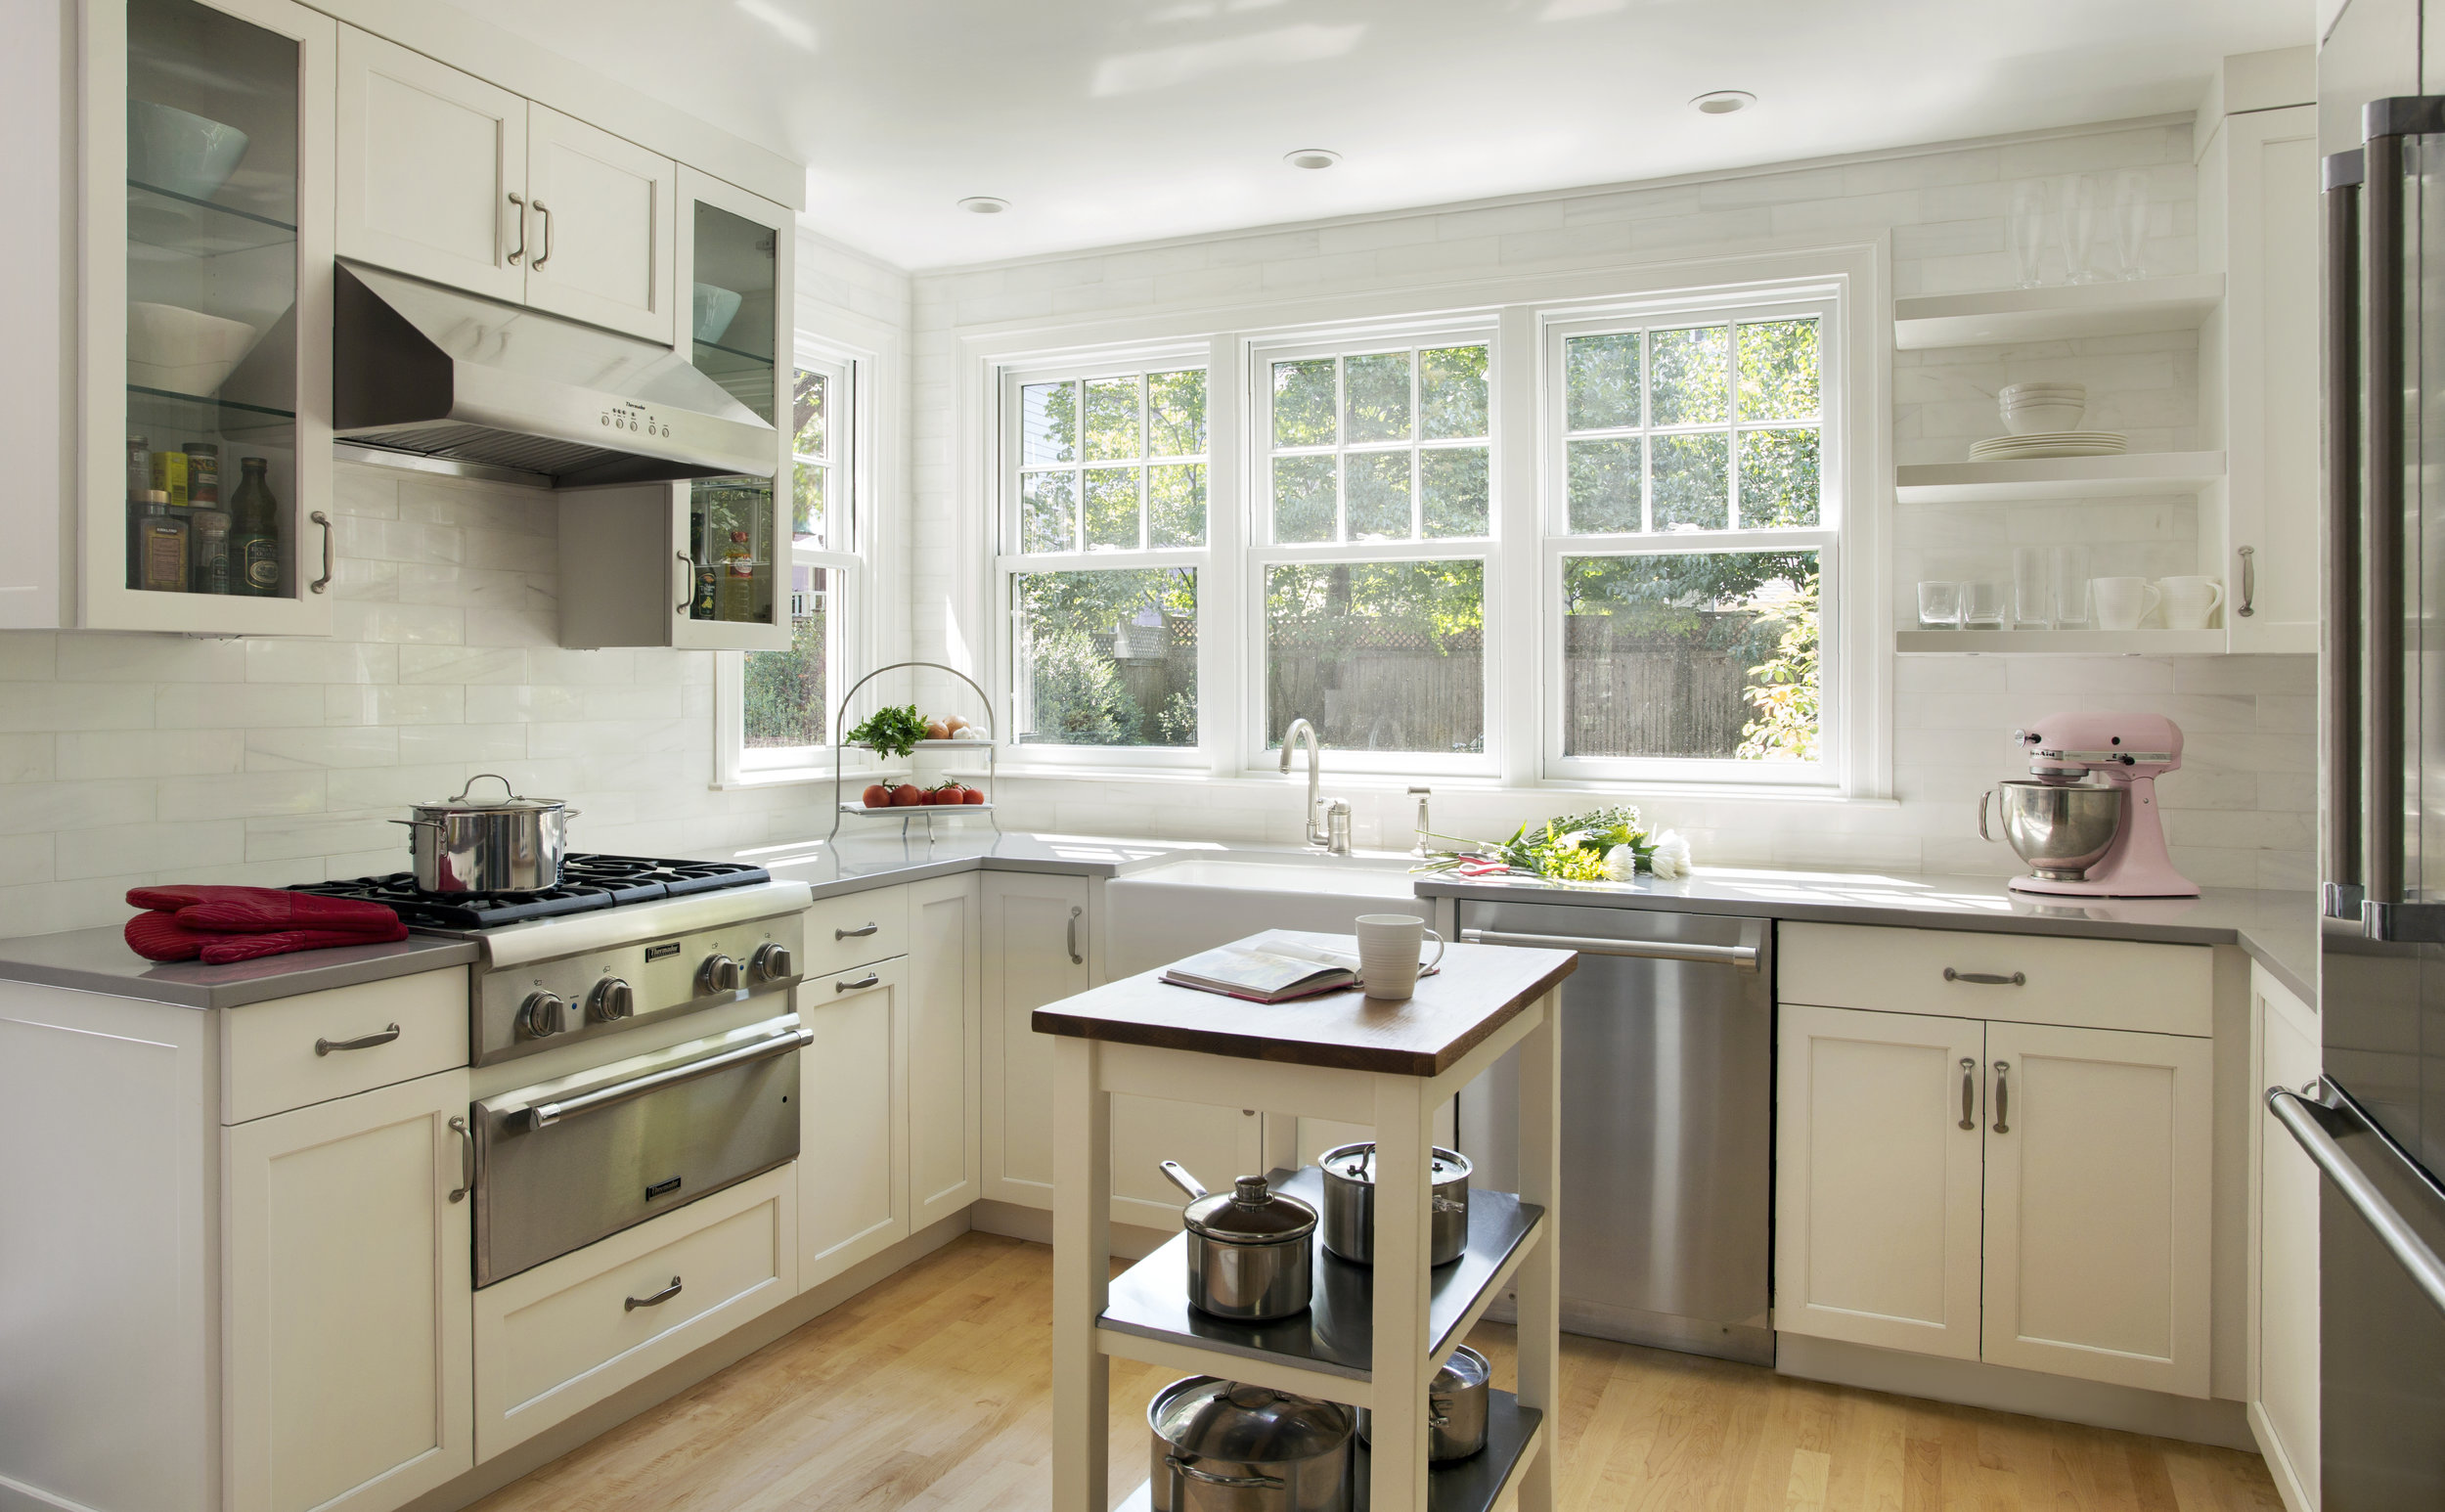 Jeff Swanson 6 14 kitchen 4 - Copy.jpg